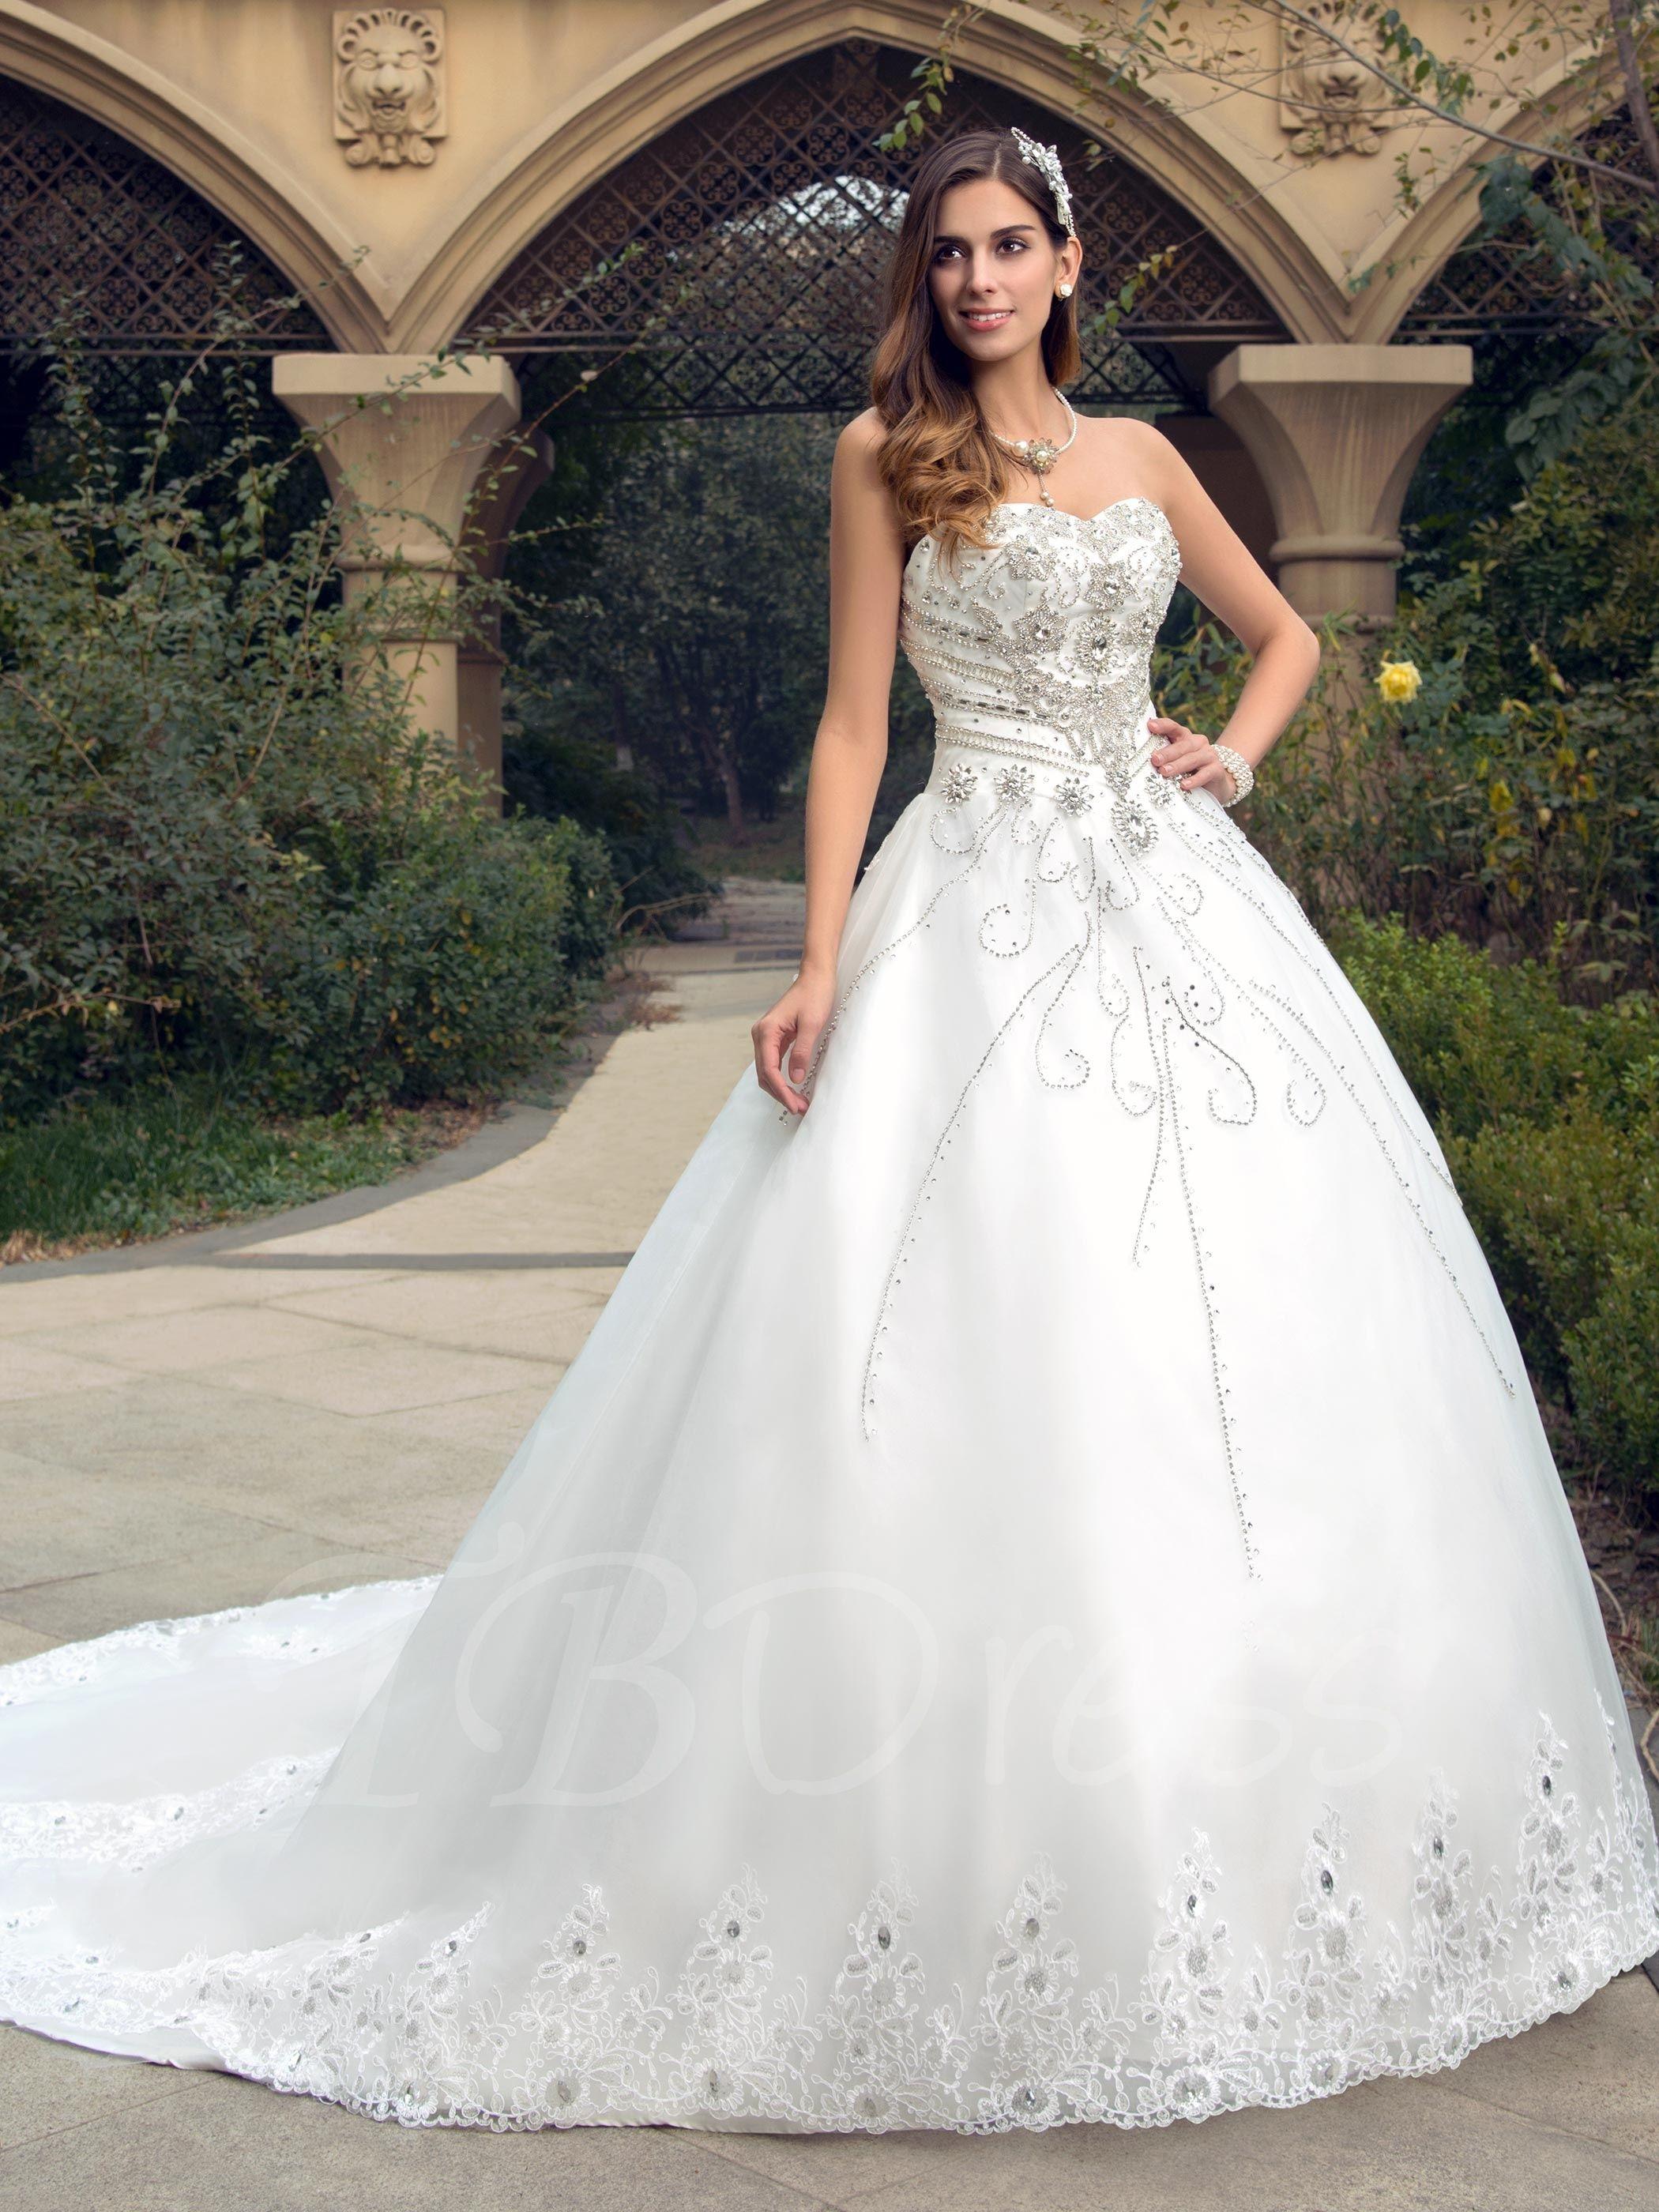 Sweetheart neckline rhinestone court train wedding dress black and